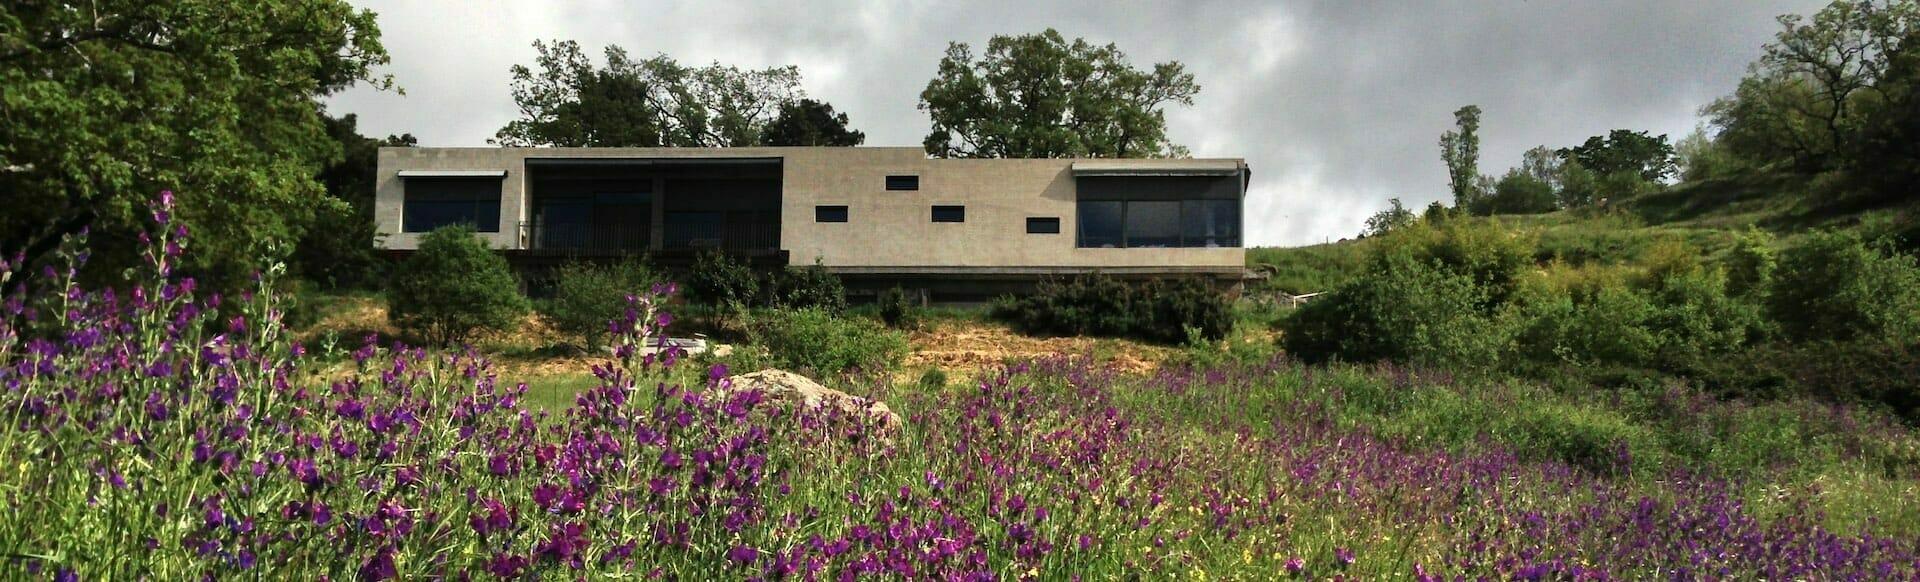 edificio sur flores